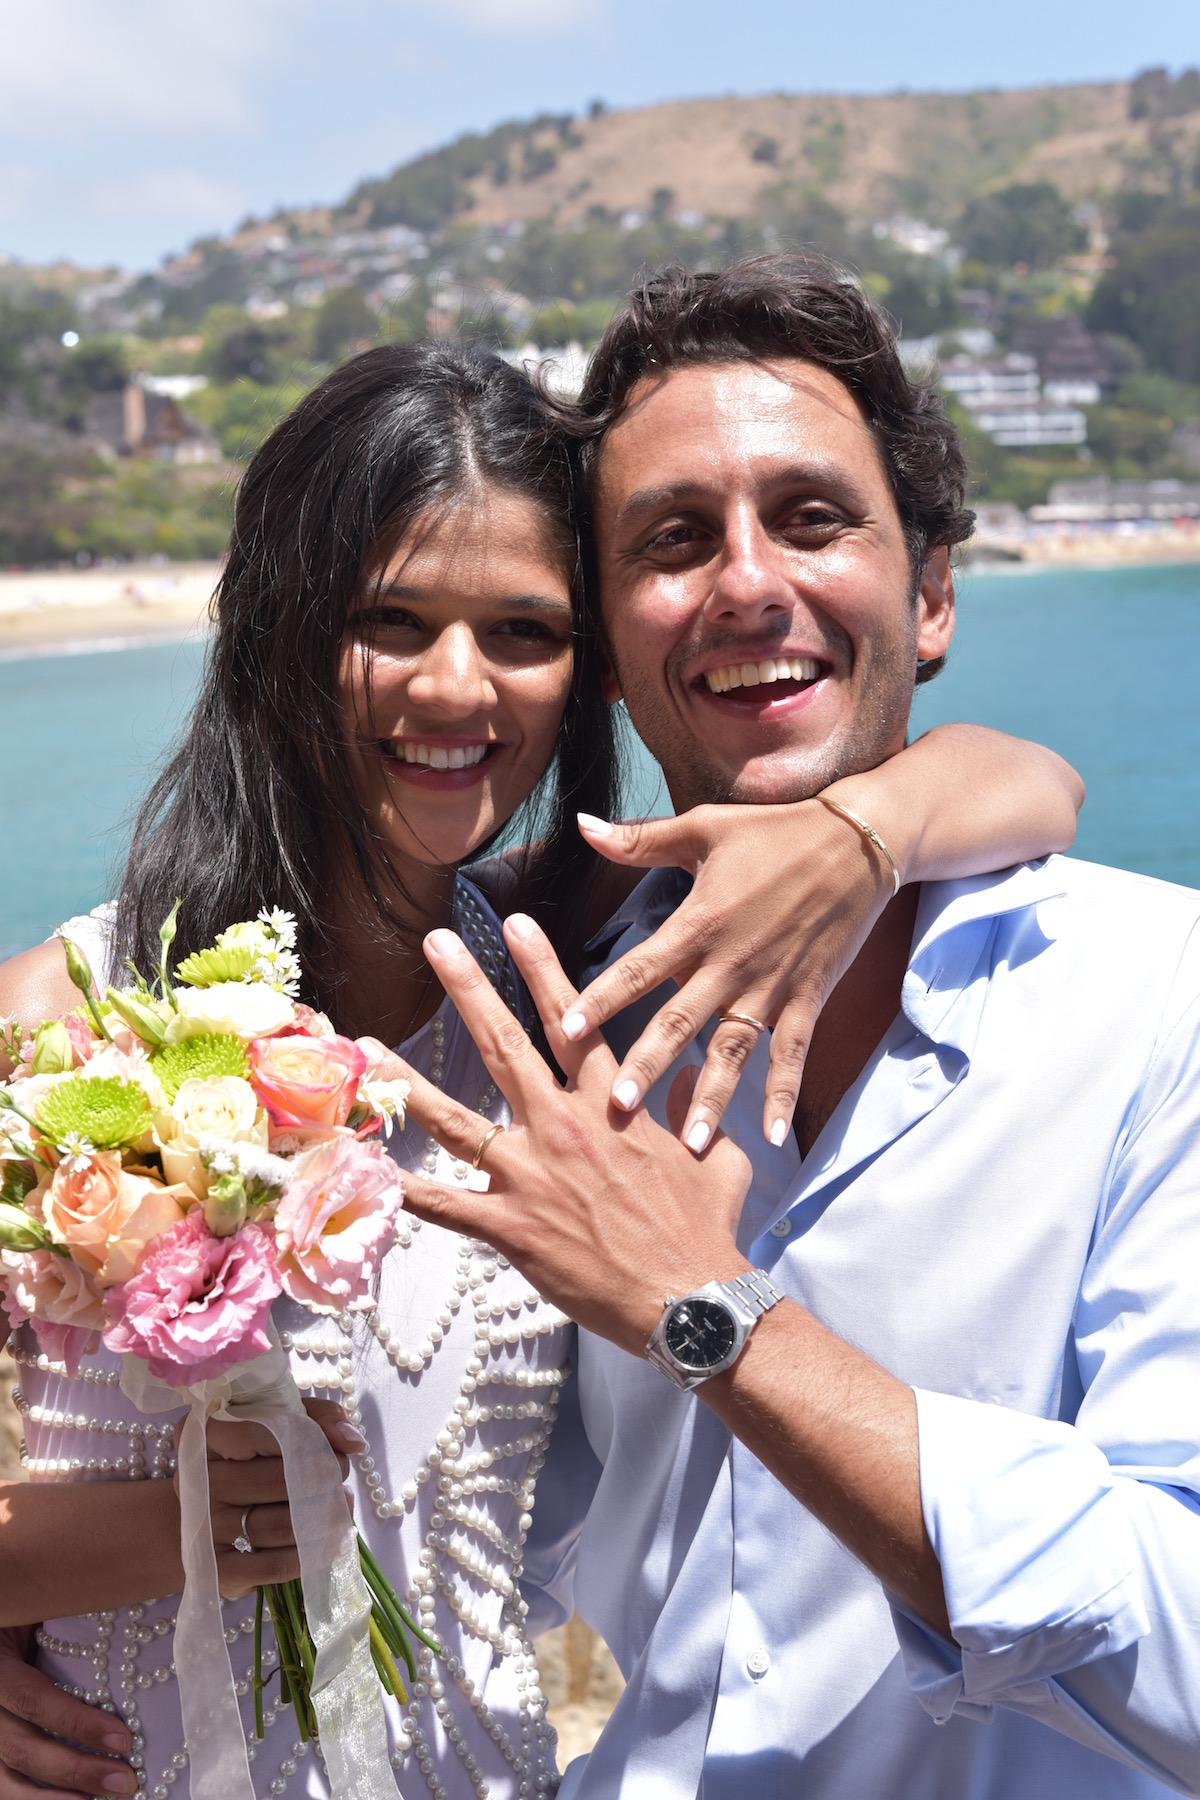 casamento-civil-beta-pinheiro-fabio-distaso-zapallar-chile-janeiro-2016-7